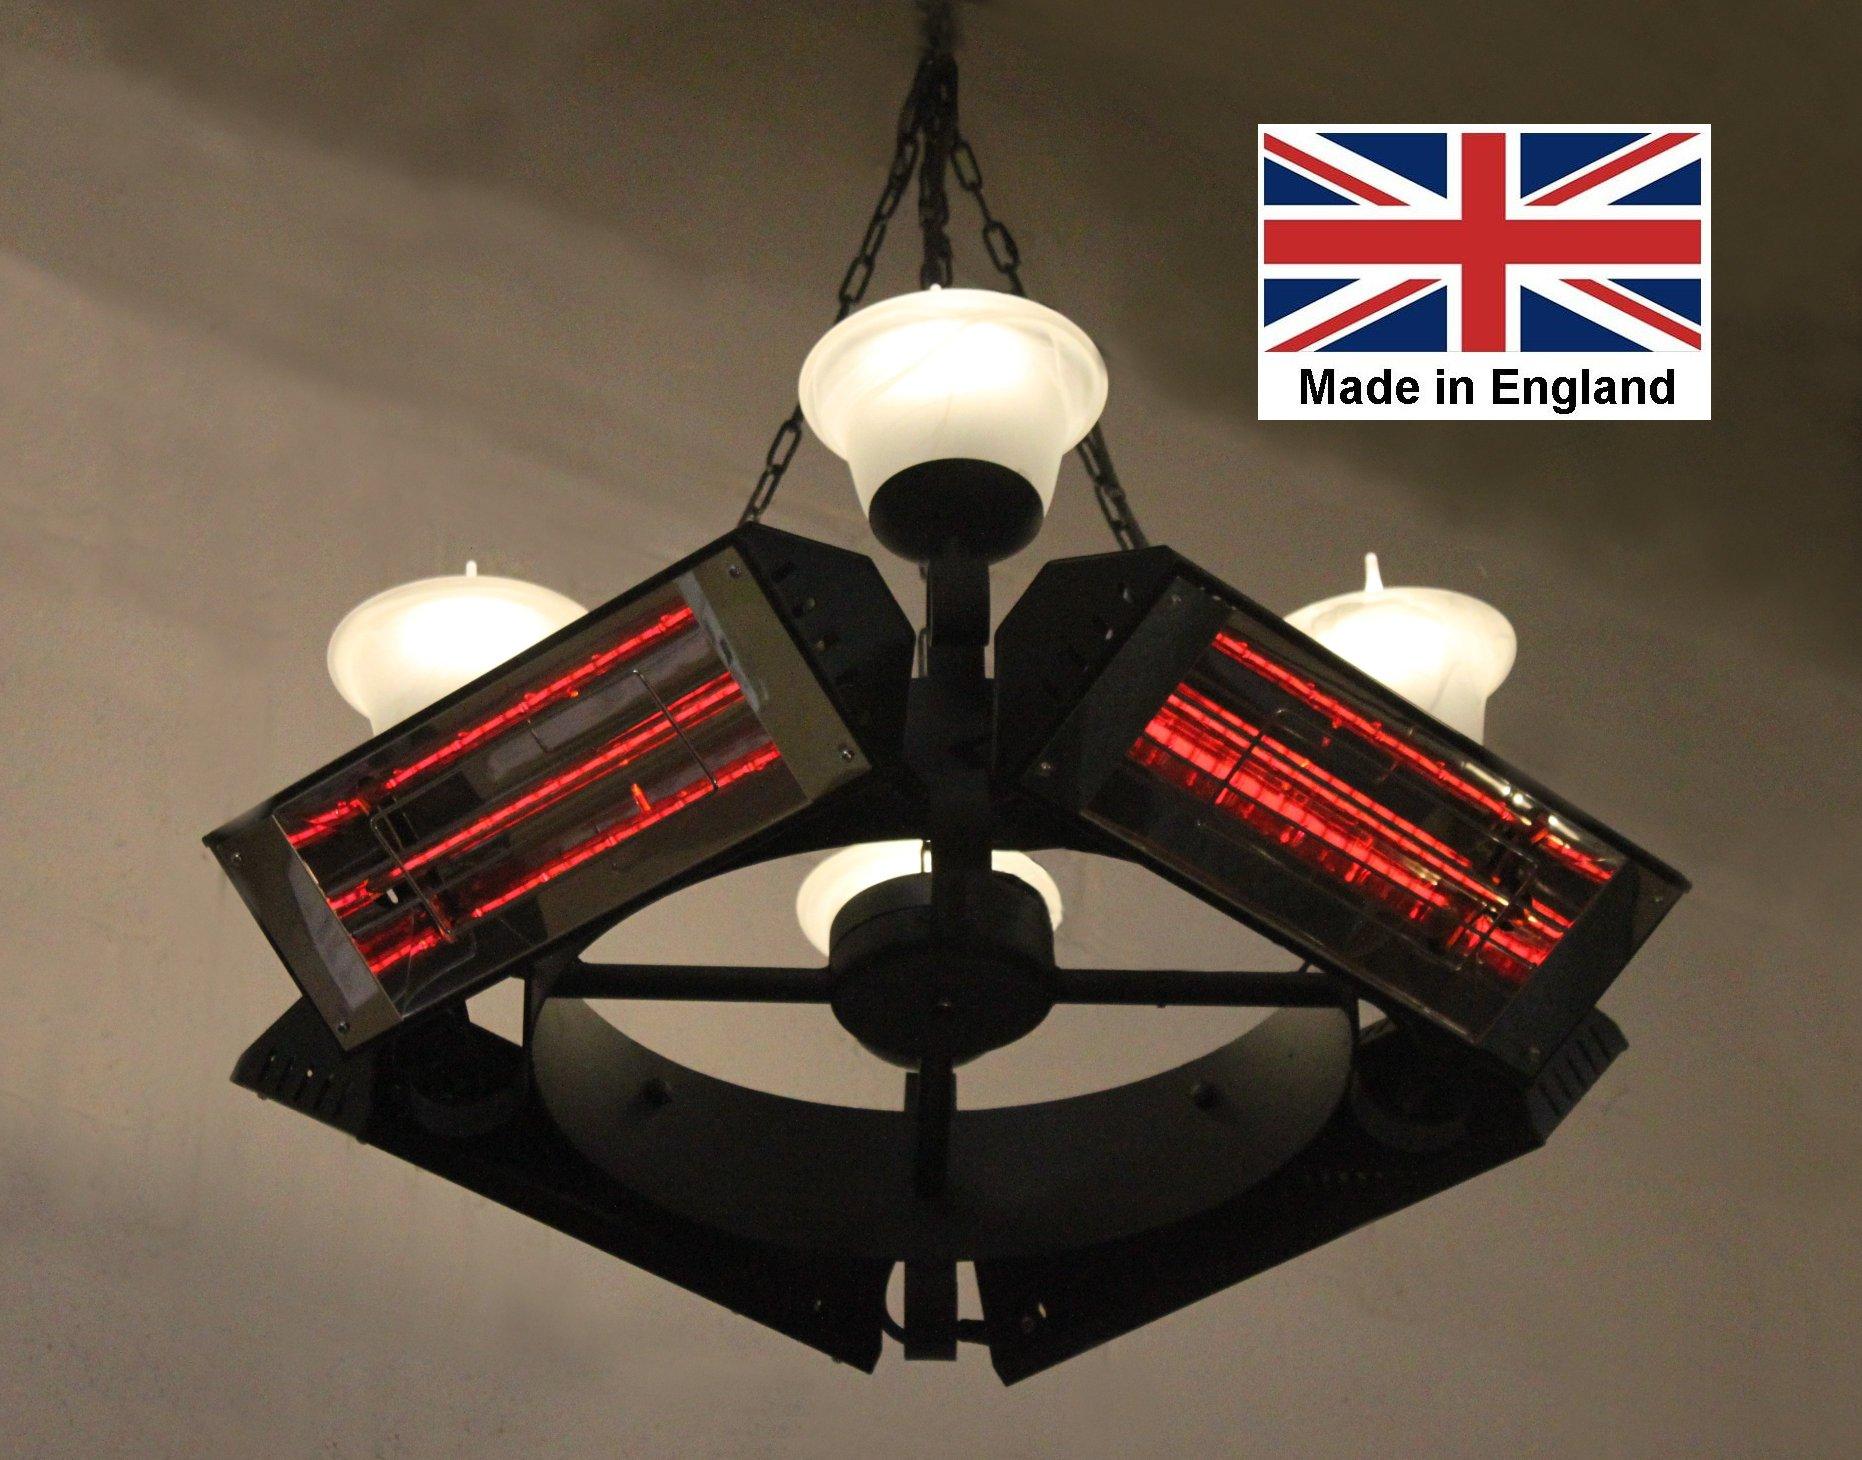 Compact Chandelier Heater 6kW 'Walton' Design